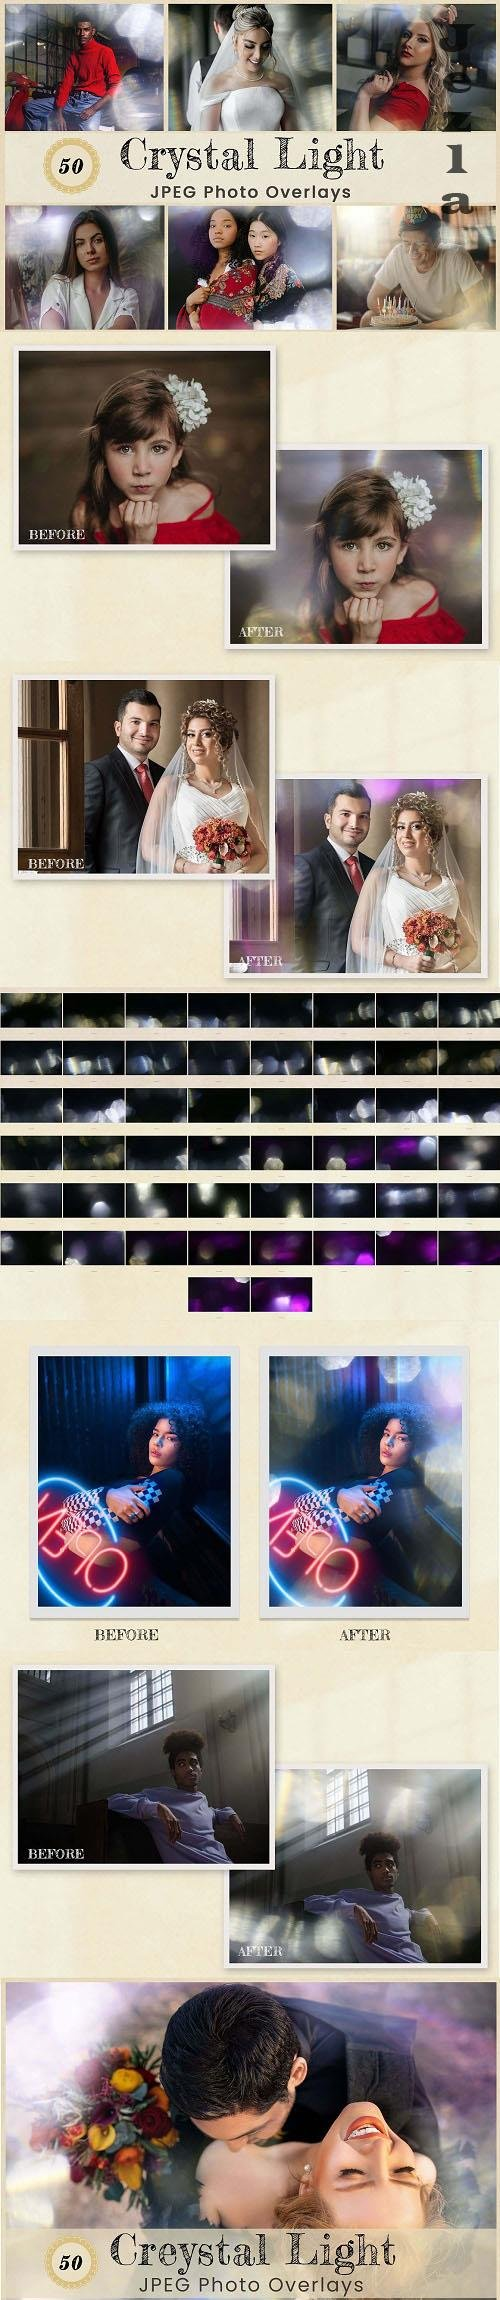 Crystal Light Photo Overlays - 6384886